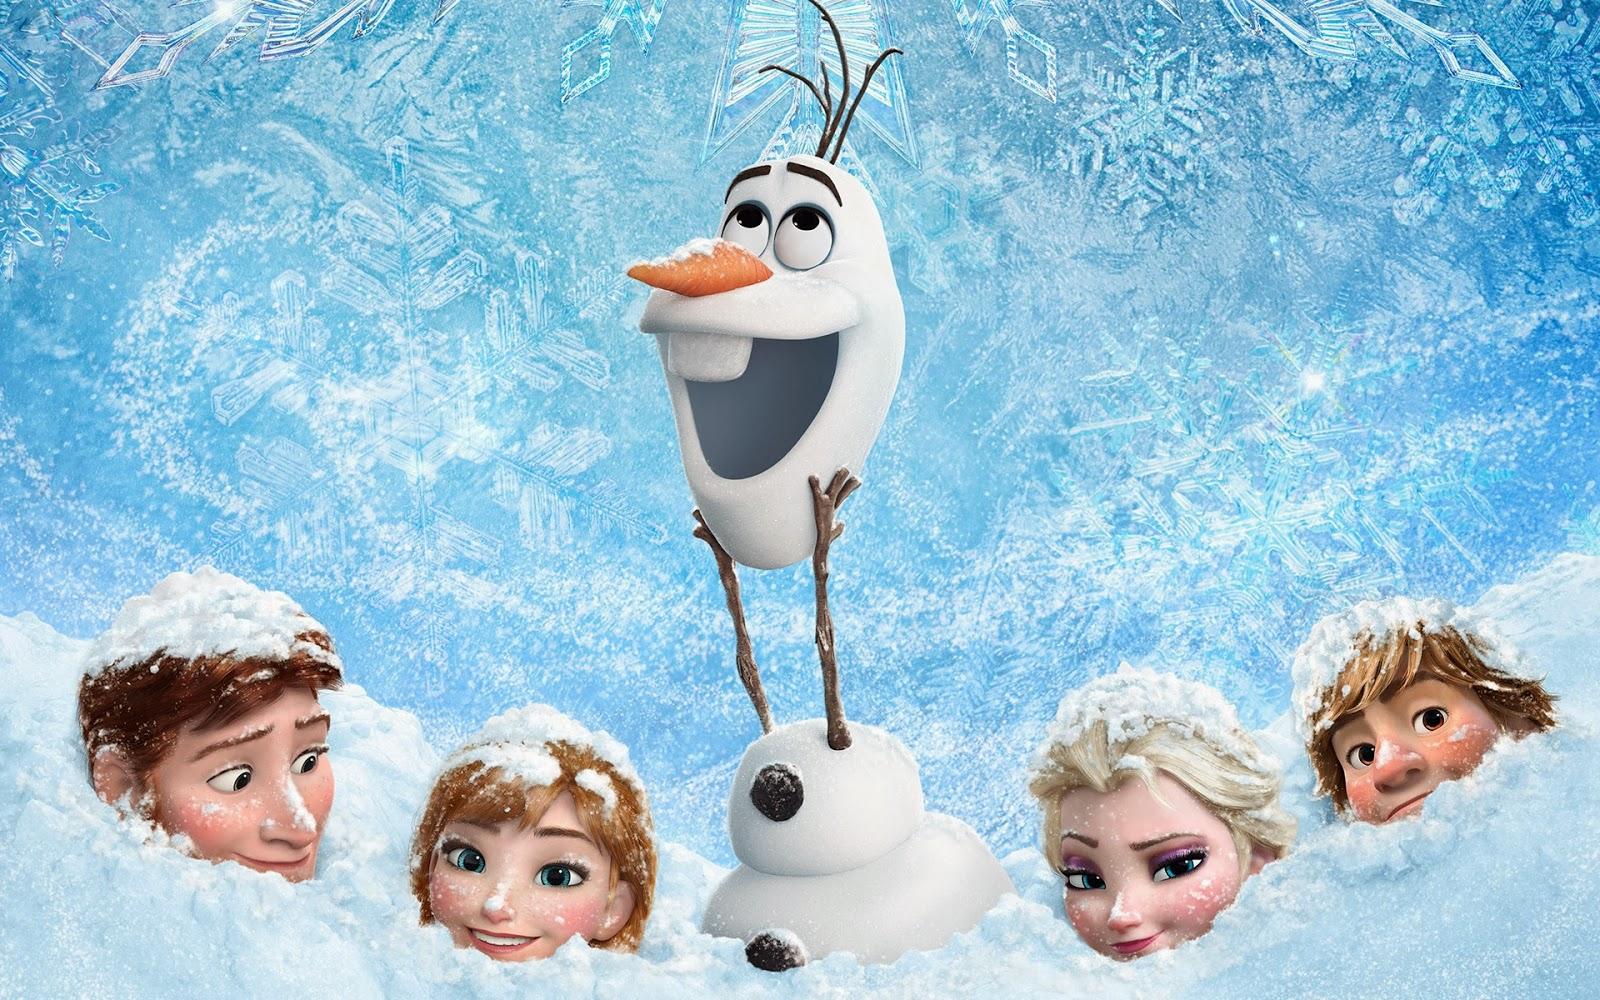 Frozen 2014 3D Animation Movie HD Wallpaper